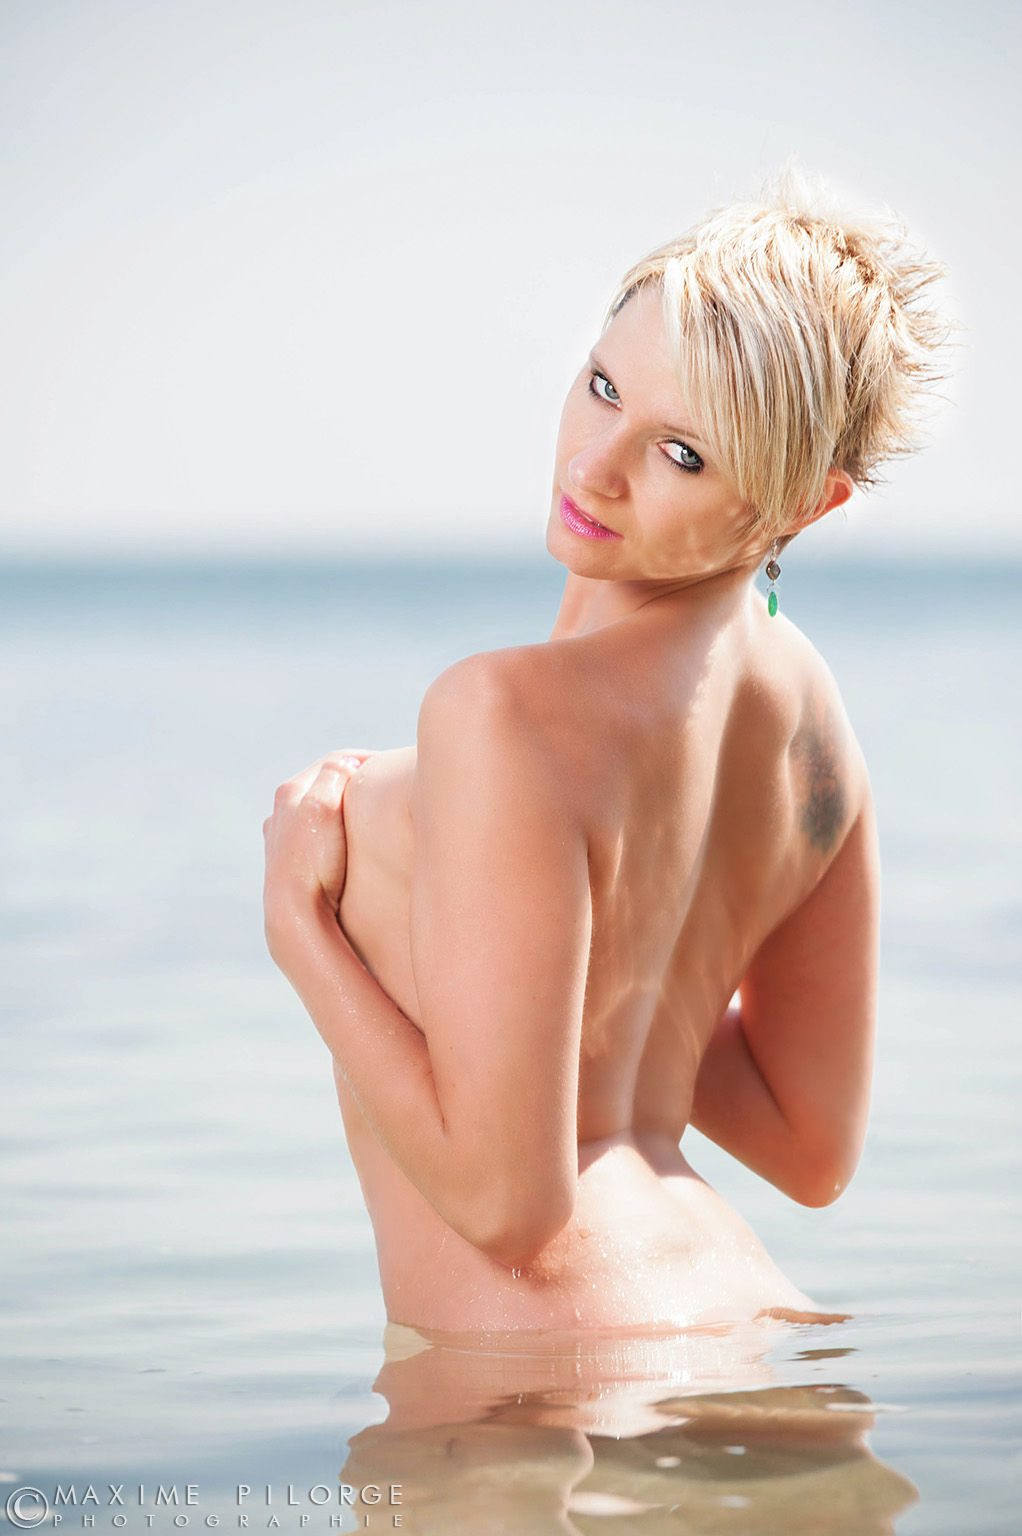 stripteaseuse quimper katell